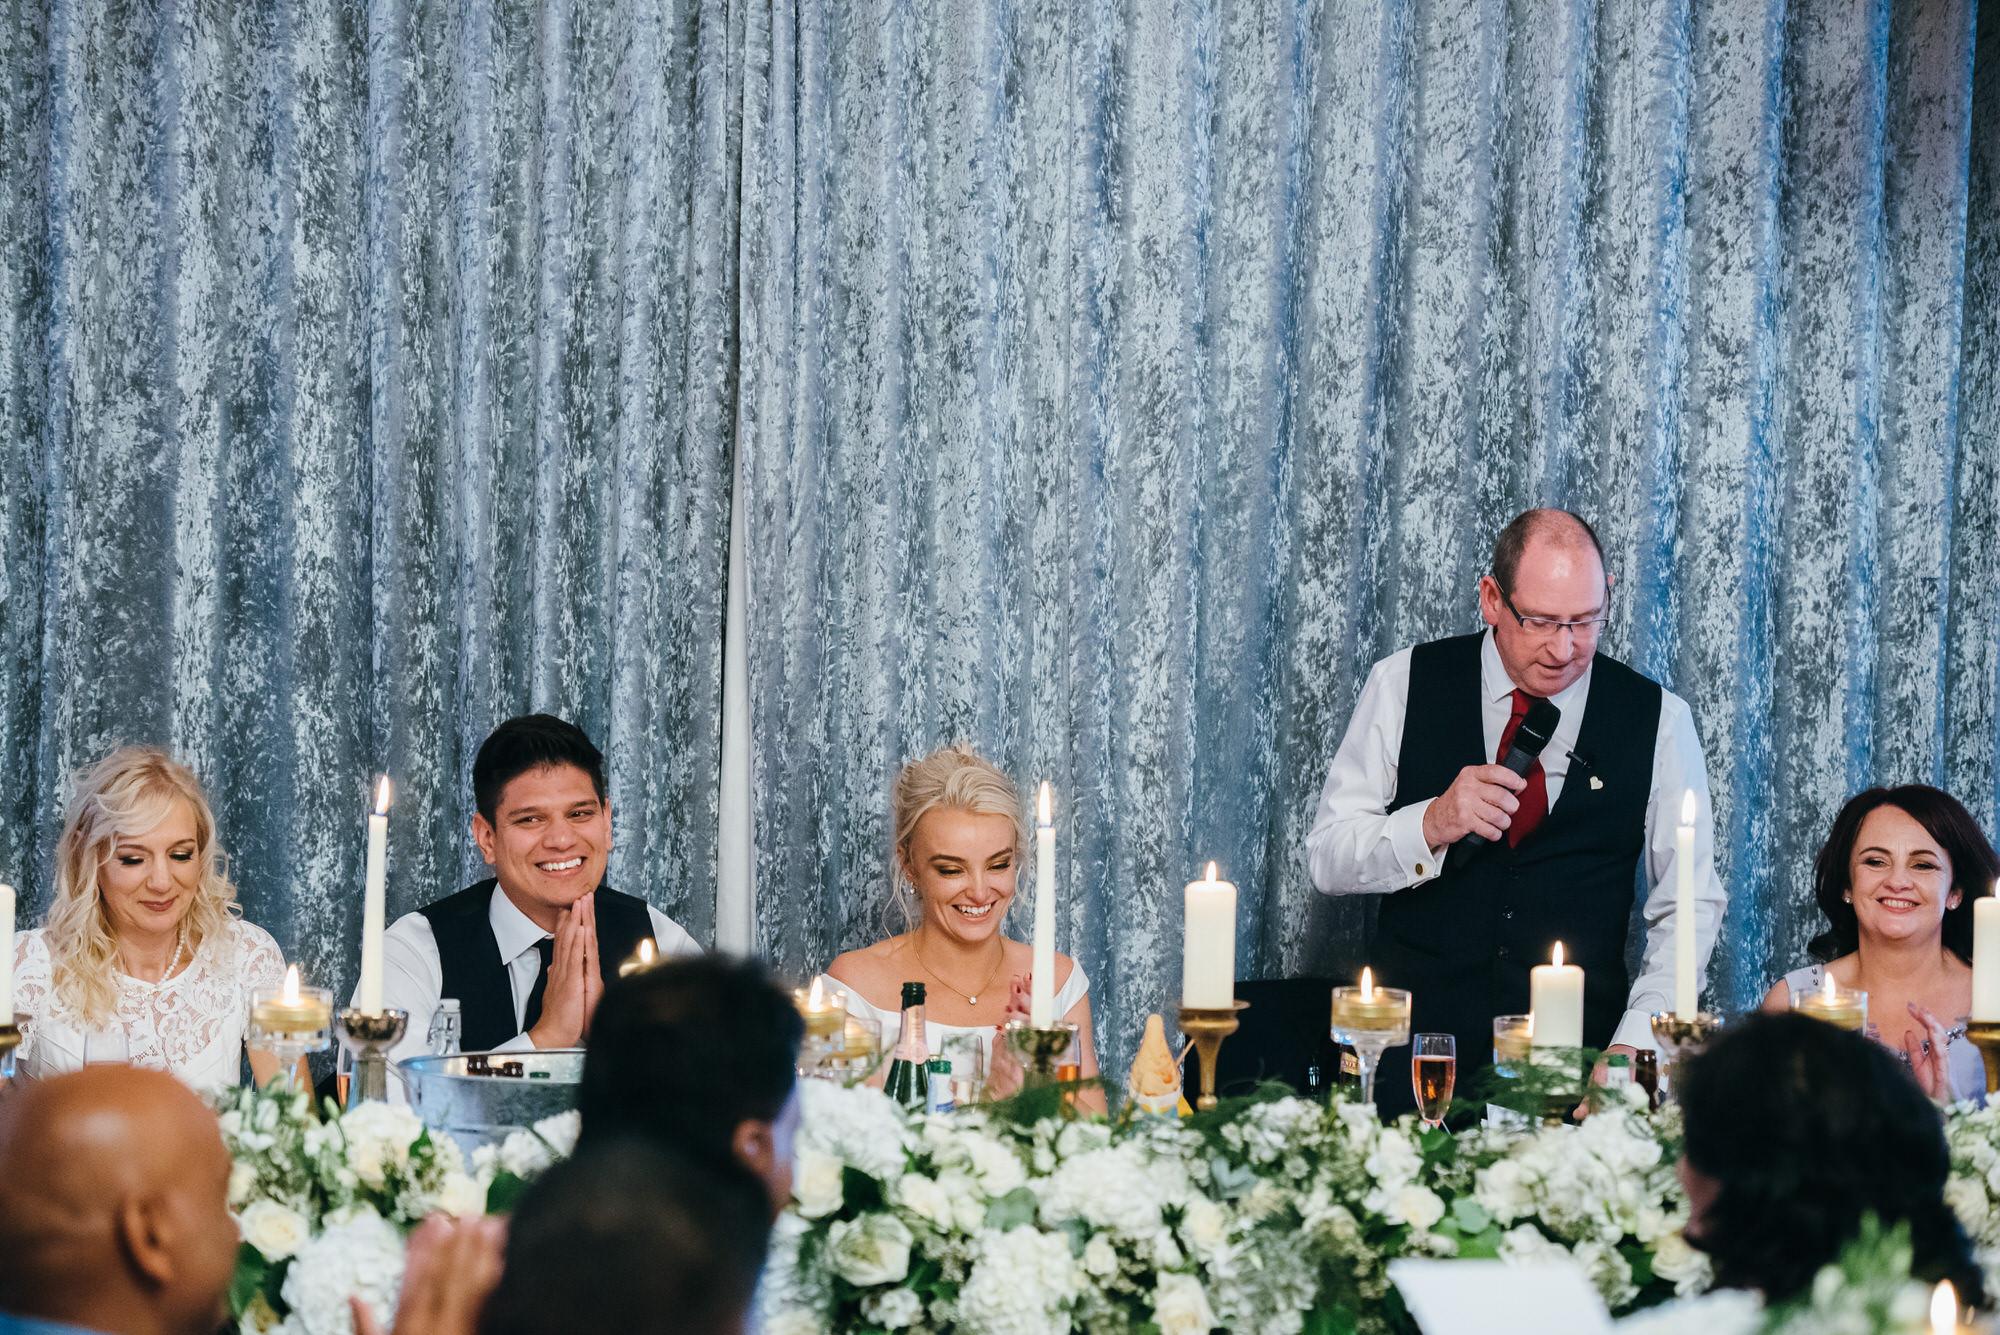 Merrydale manor wedding photography 085